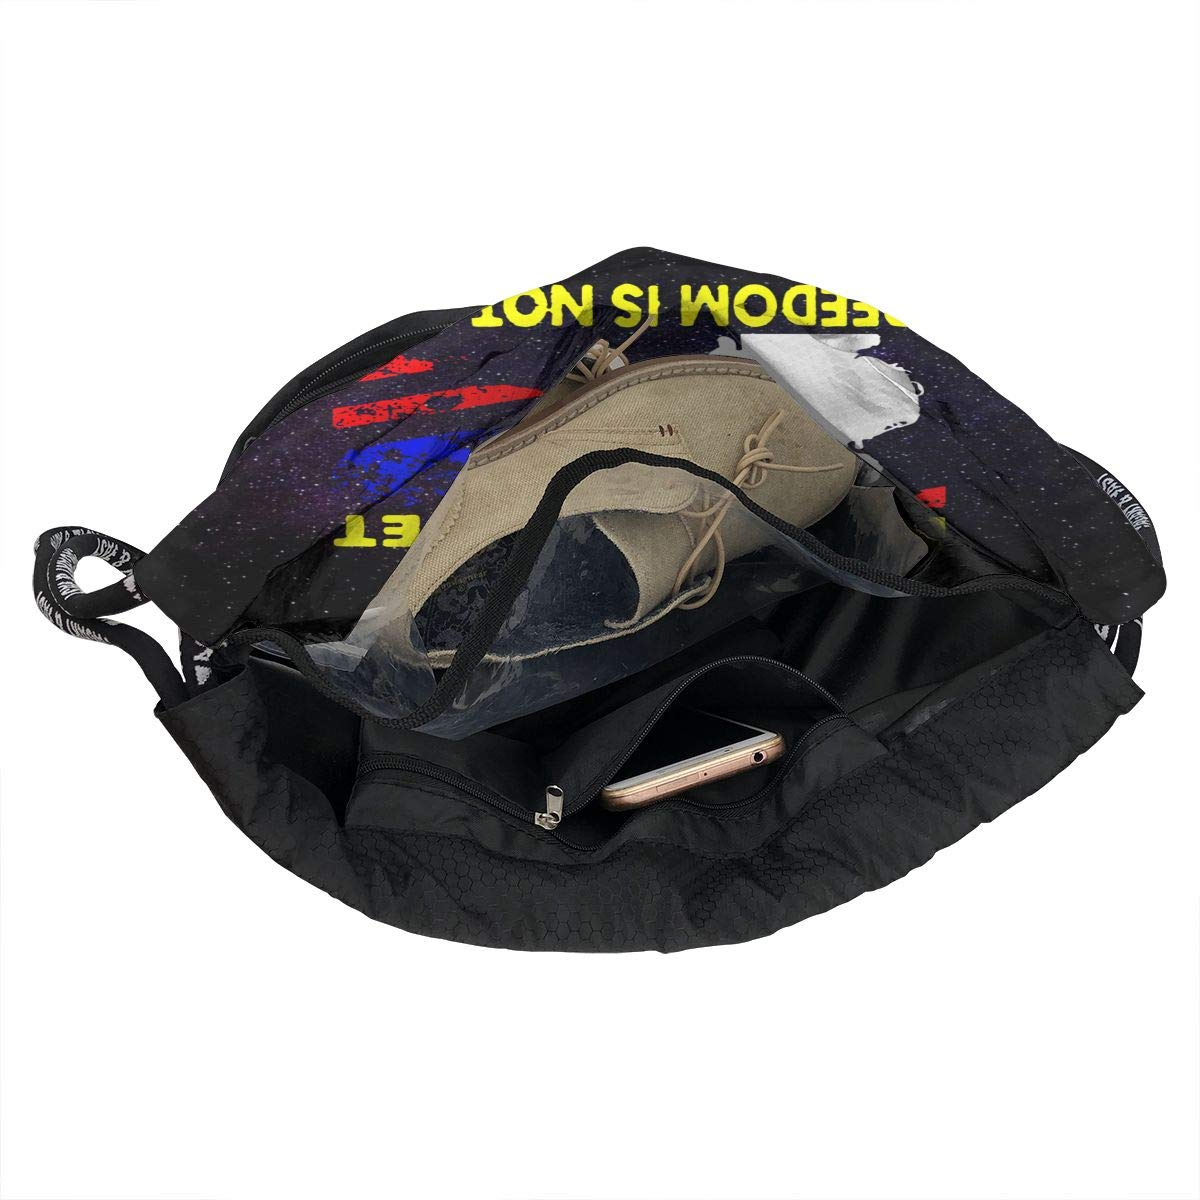 SG0HGO Drawstring Pack Veteran Day Never Forget Men and Women Yoga Dance Travel Rucksack Shoulder Bags